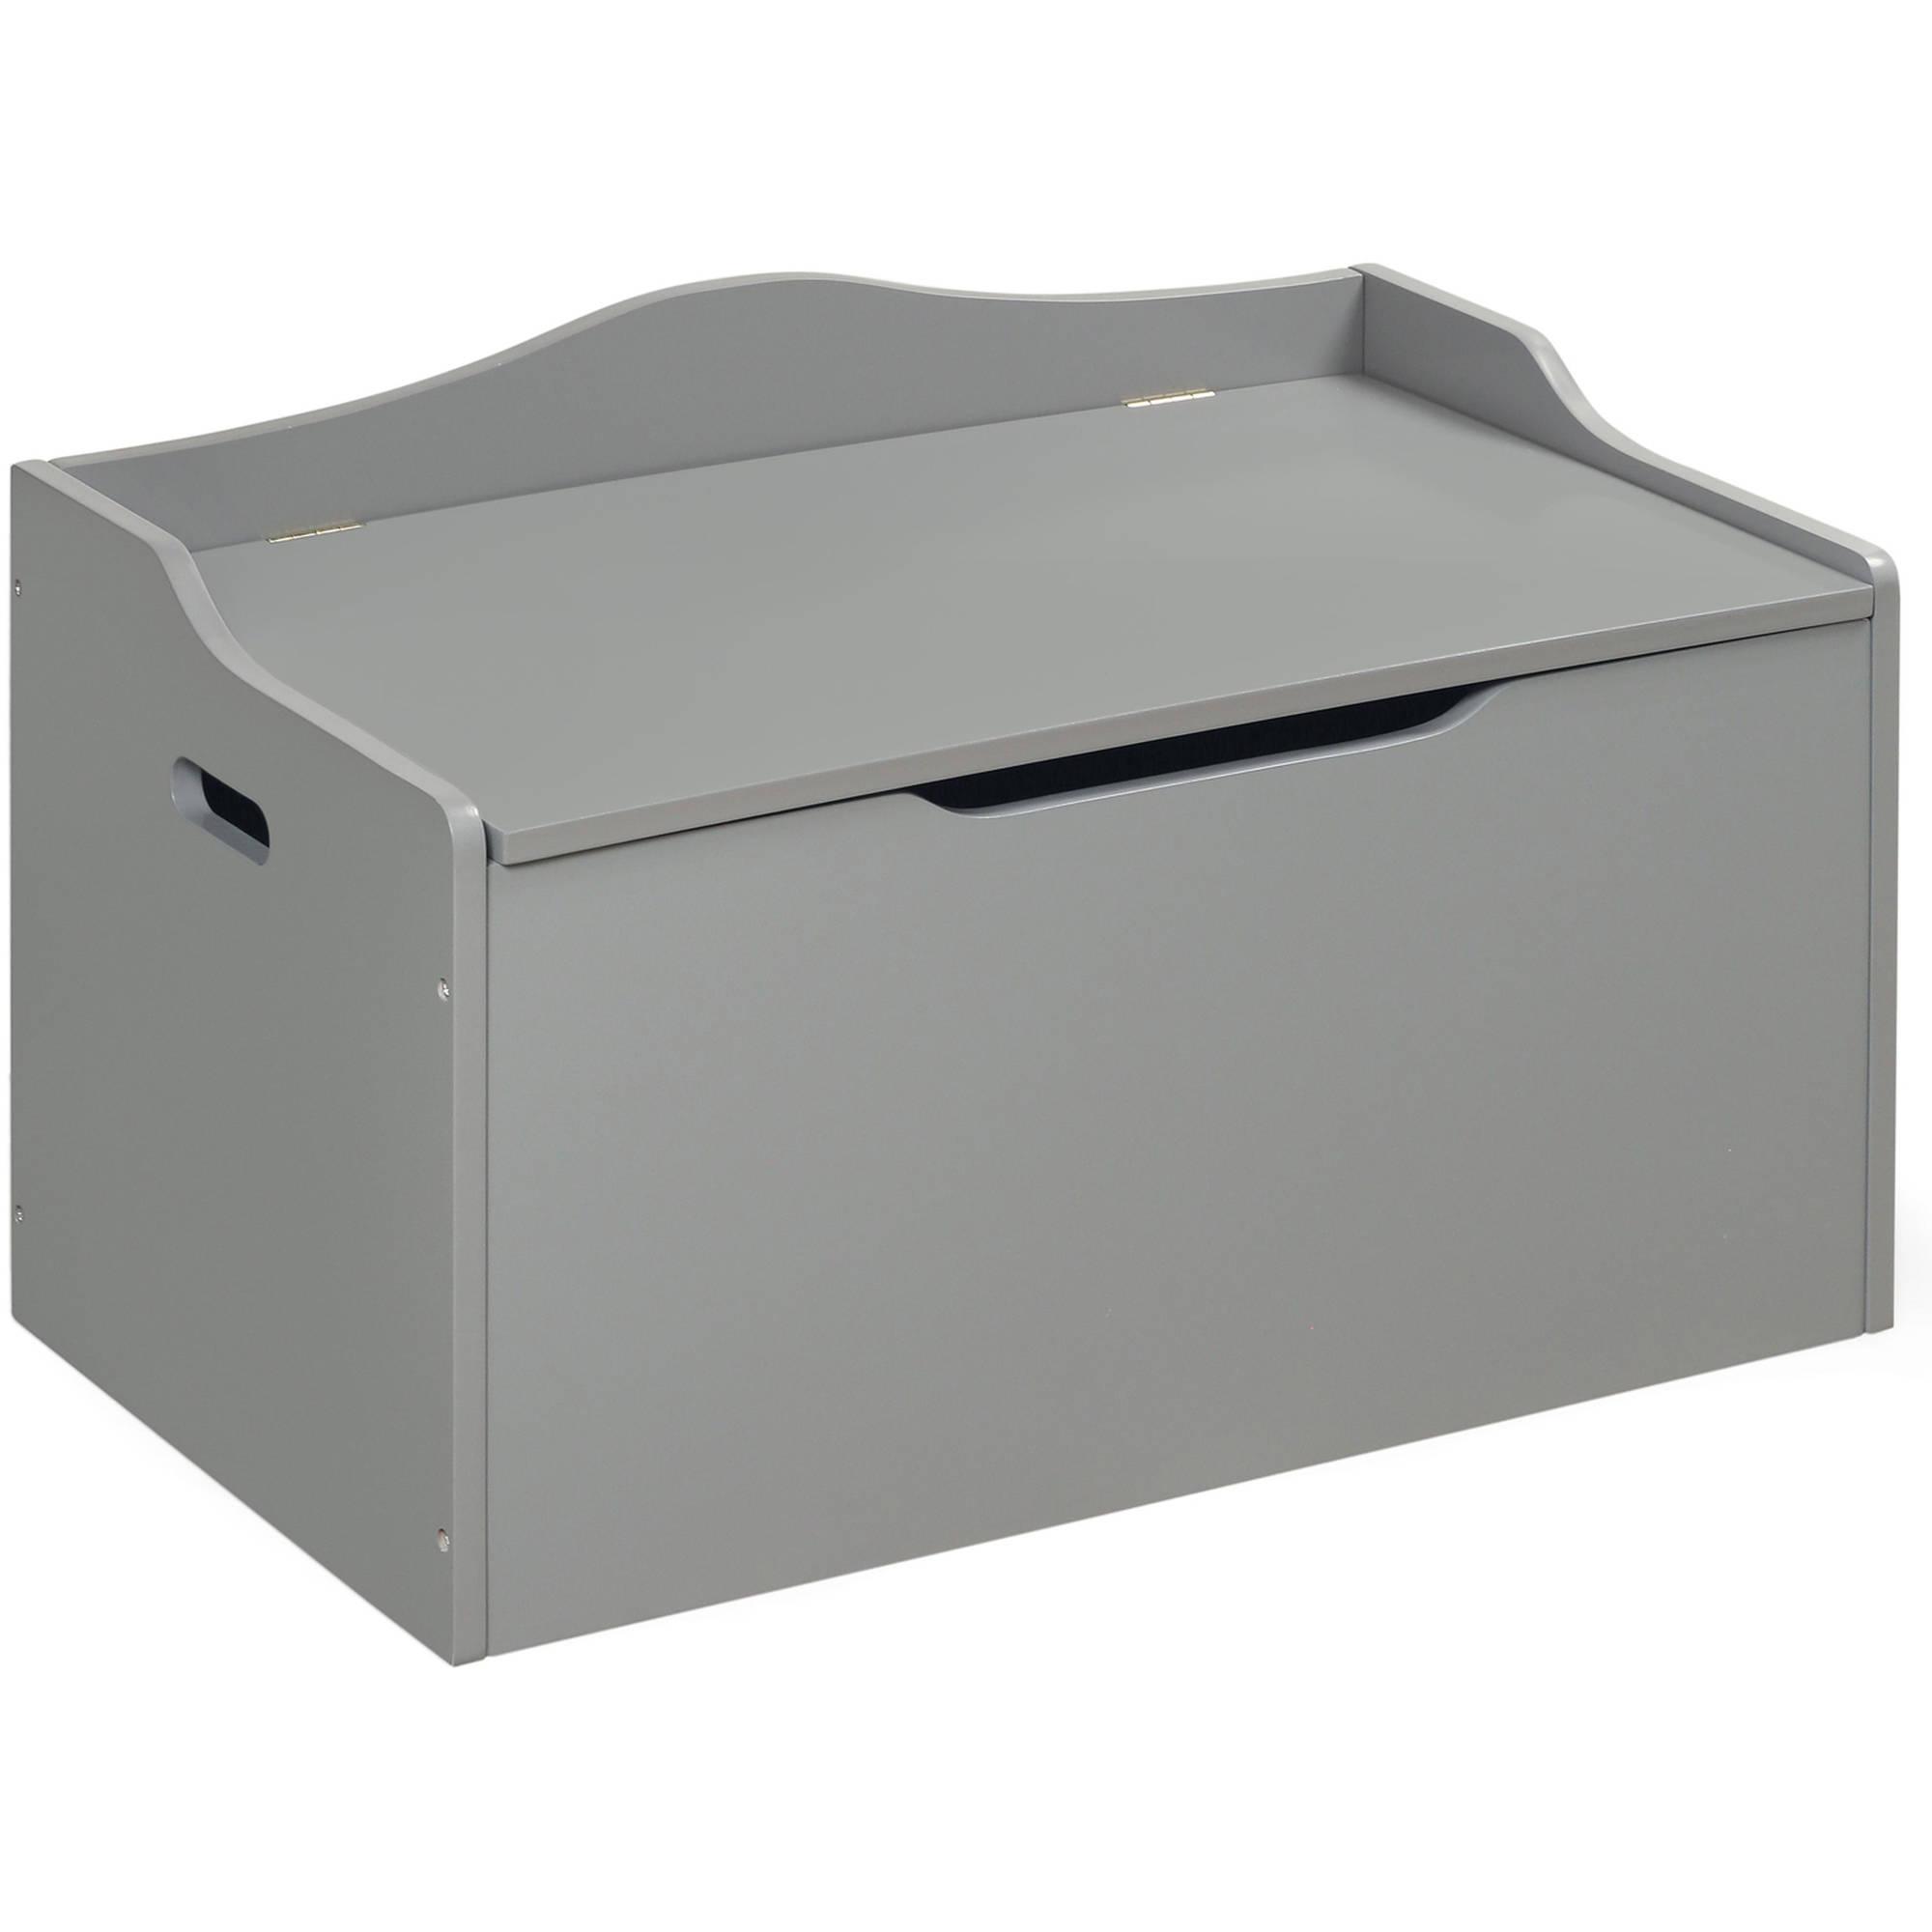 Badger Basket Bench Top Toy Box, Gray by Badger Basket